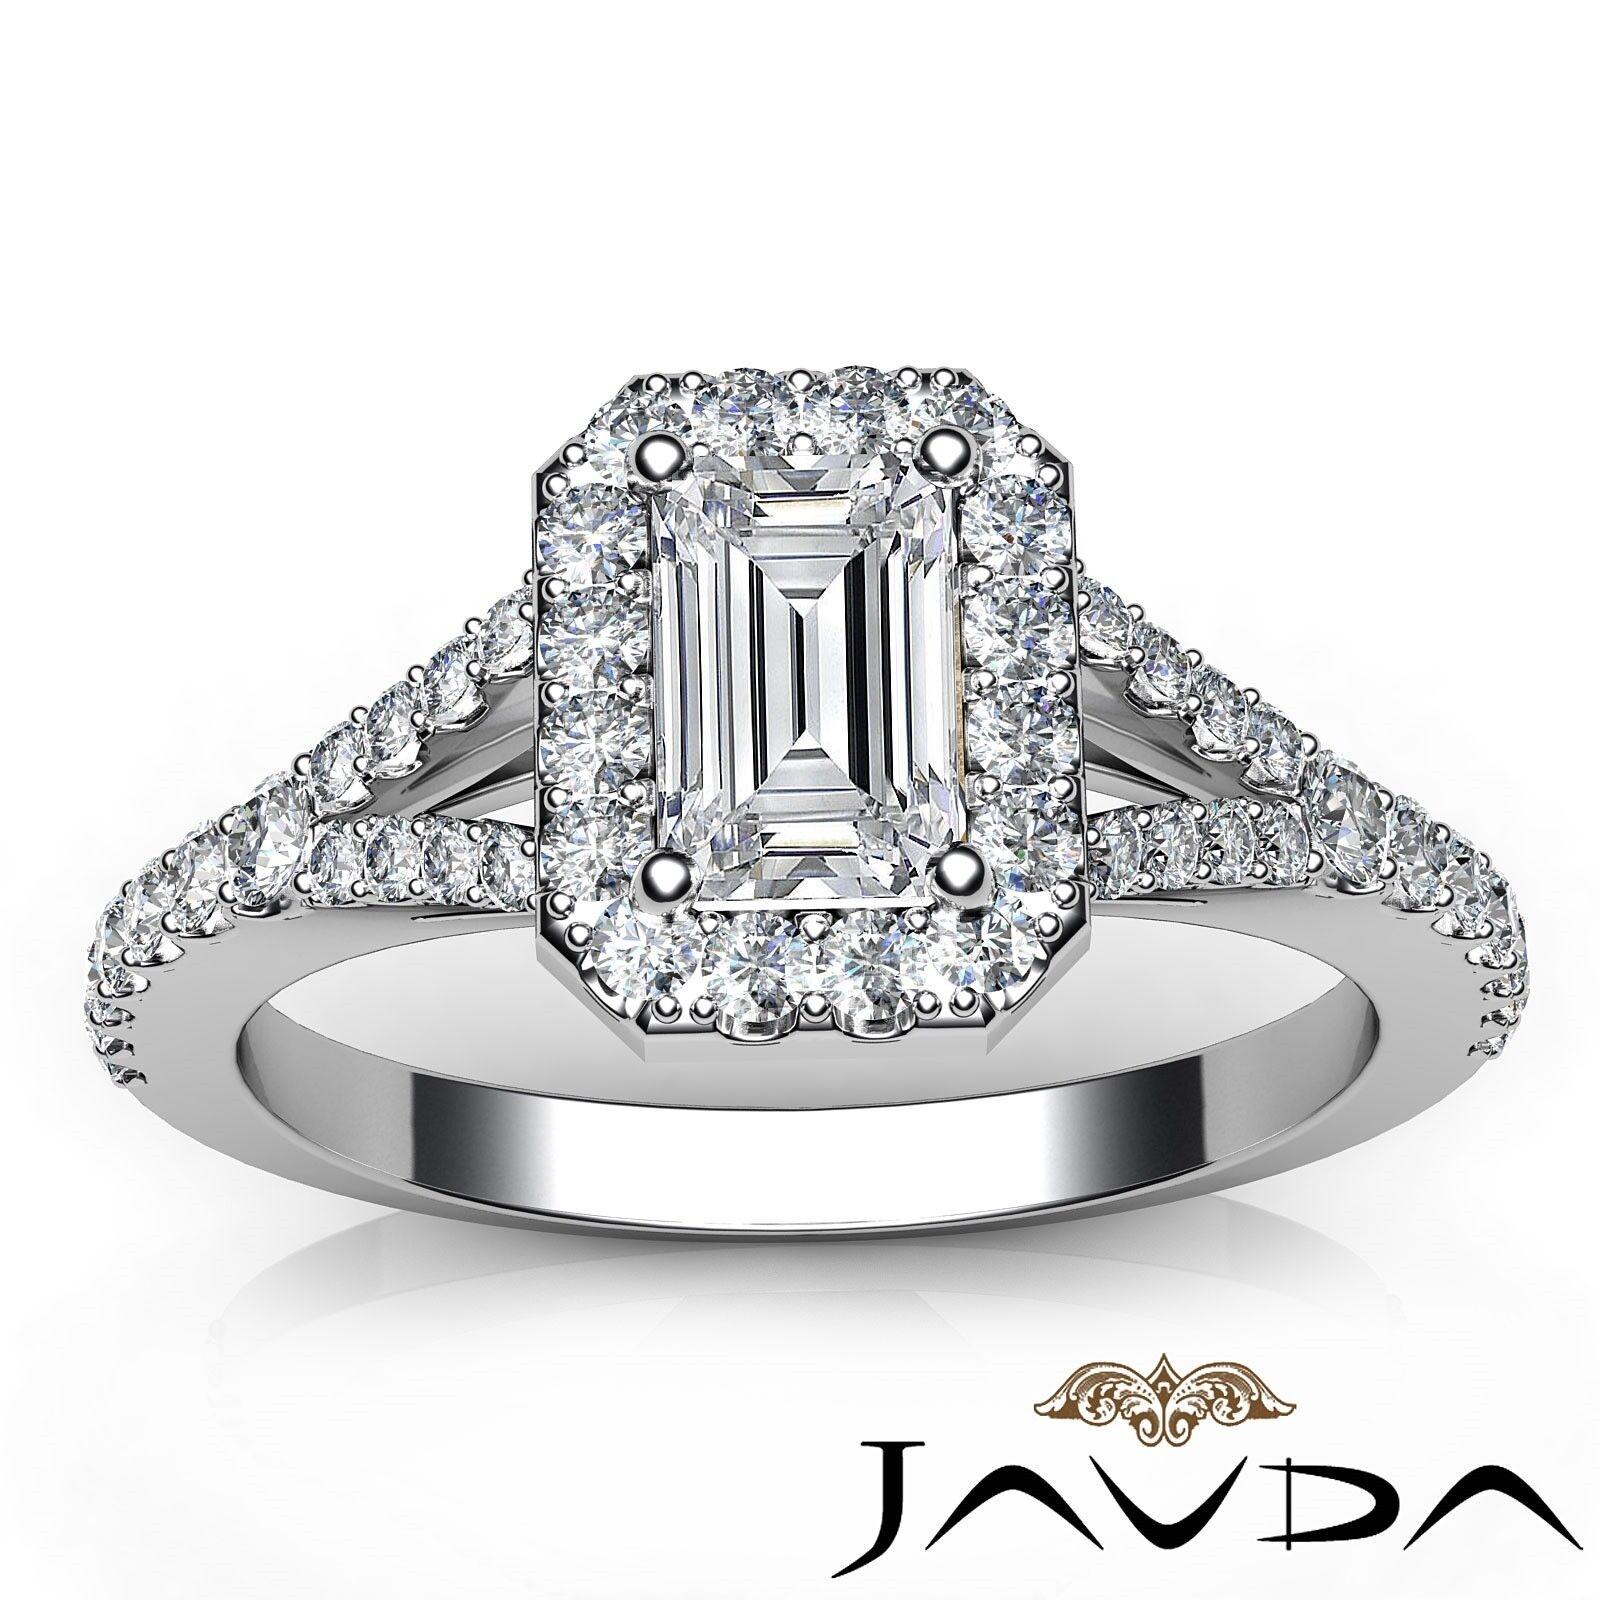 1.23ctw Halo U Pave Stone Emerald Diamond Engagement Ring GIA H-SI1 White Gold 6